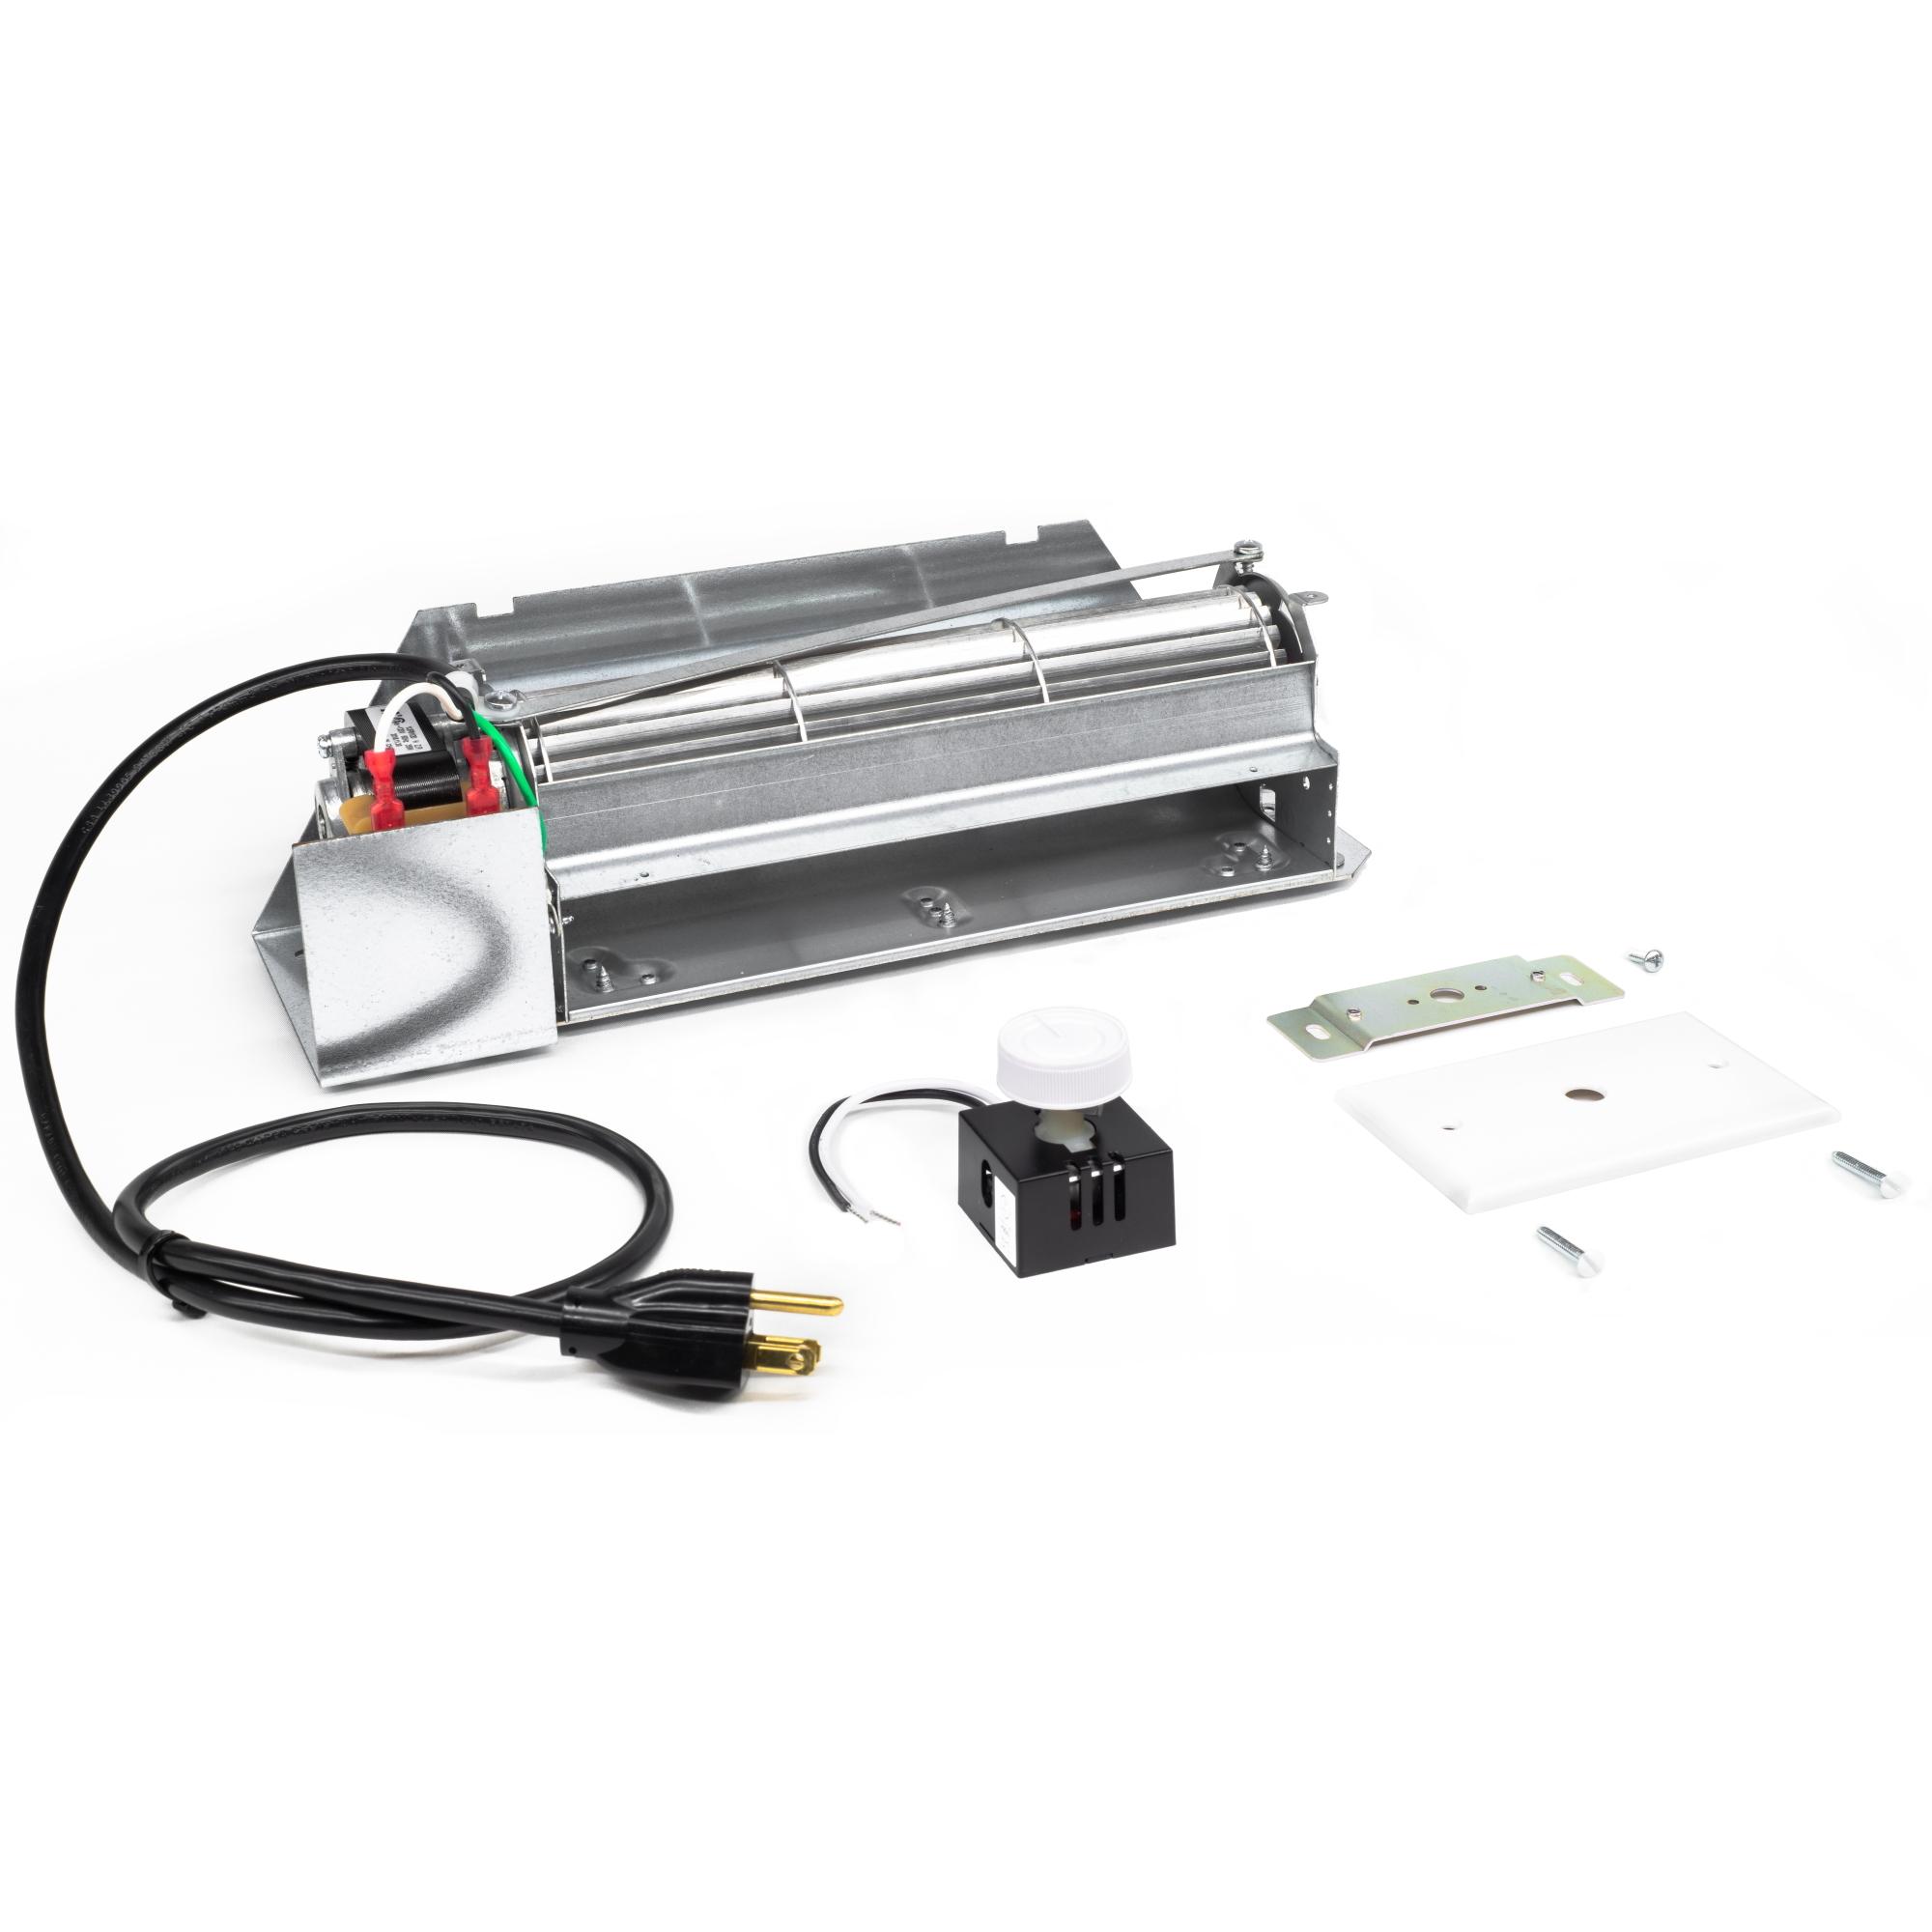 FBK-200 Blower Fan Conversion Kit for Astria, Lennox & Superior Fireplaces